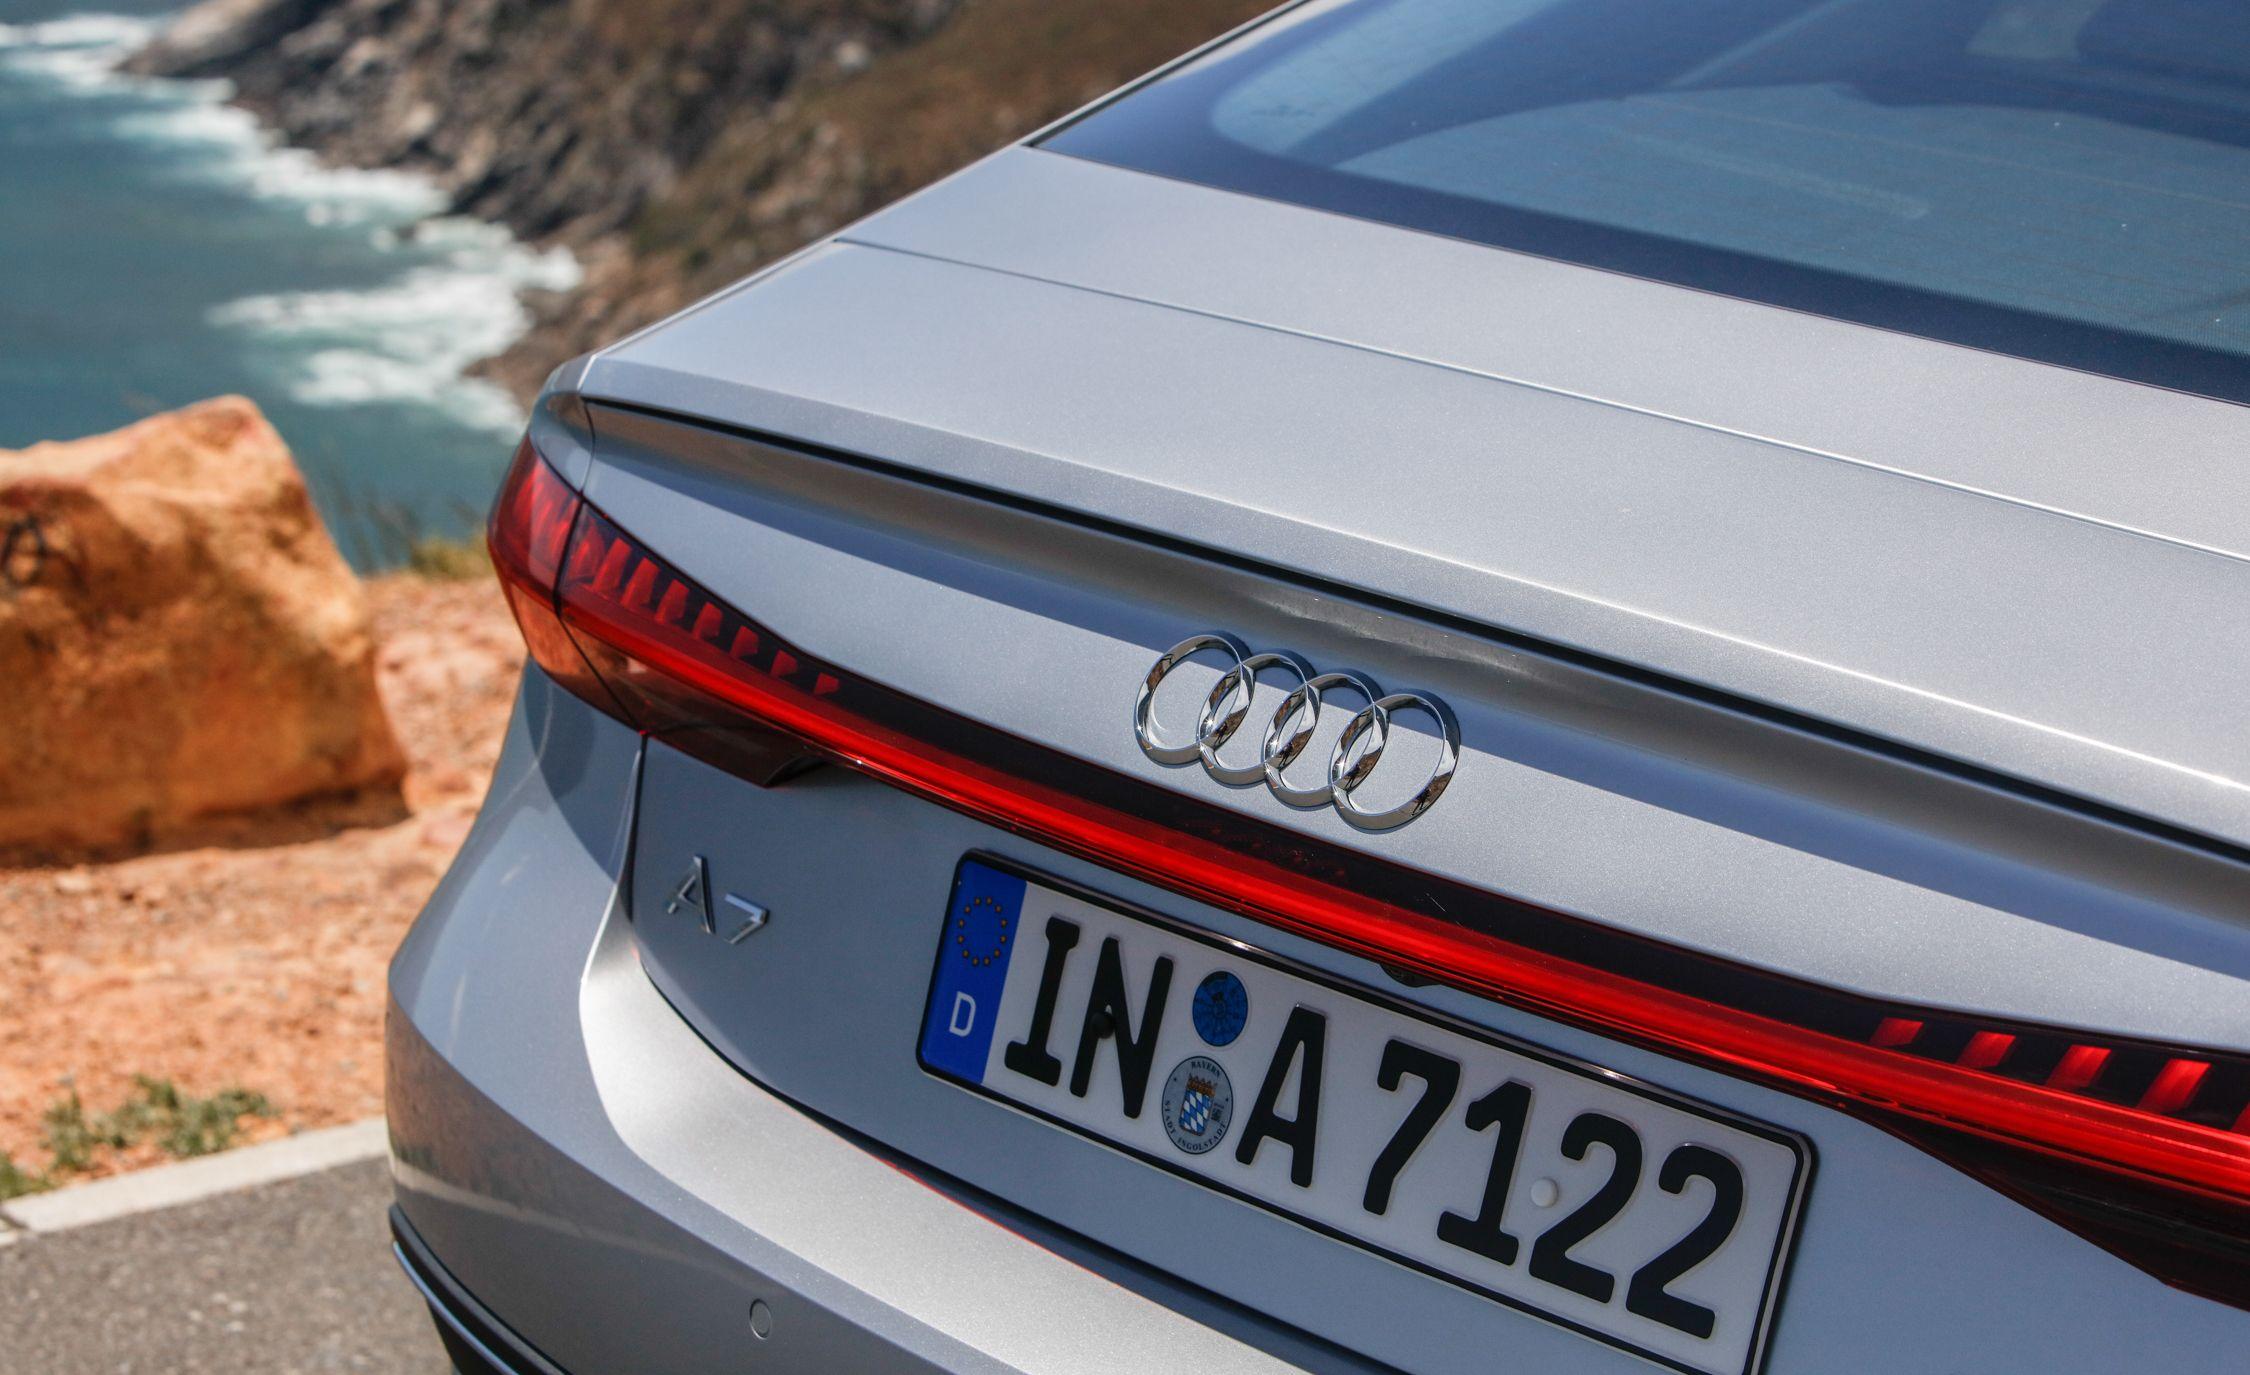 2019-Audi-A7-Sportback-155-1.jpg